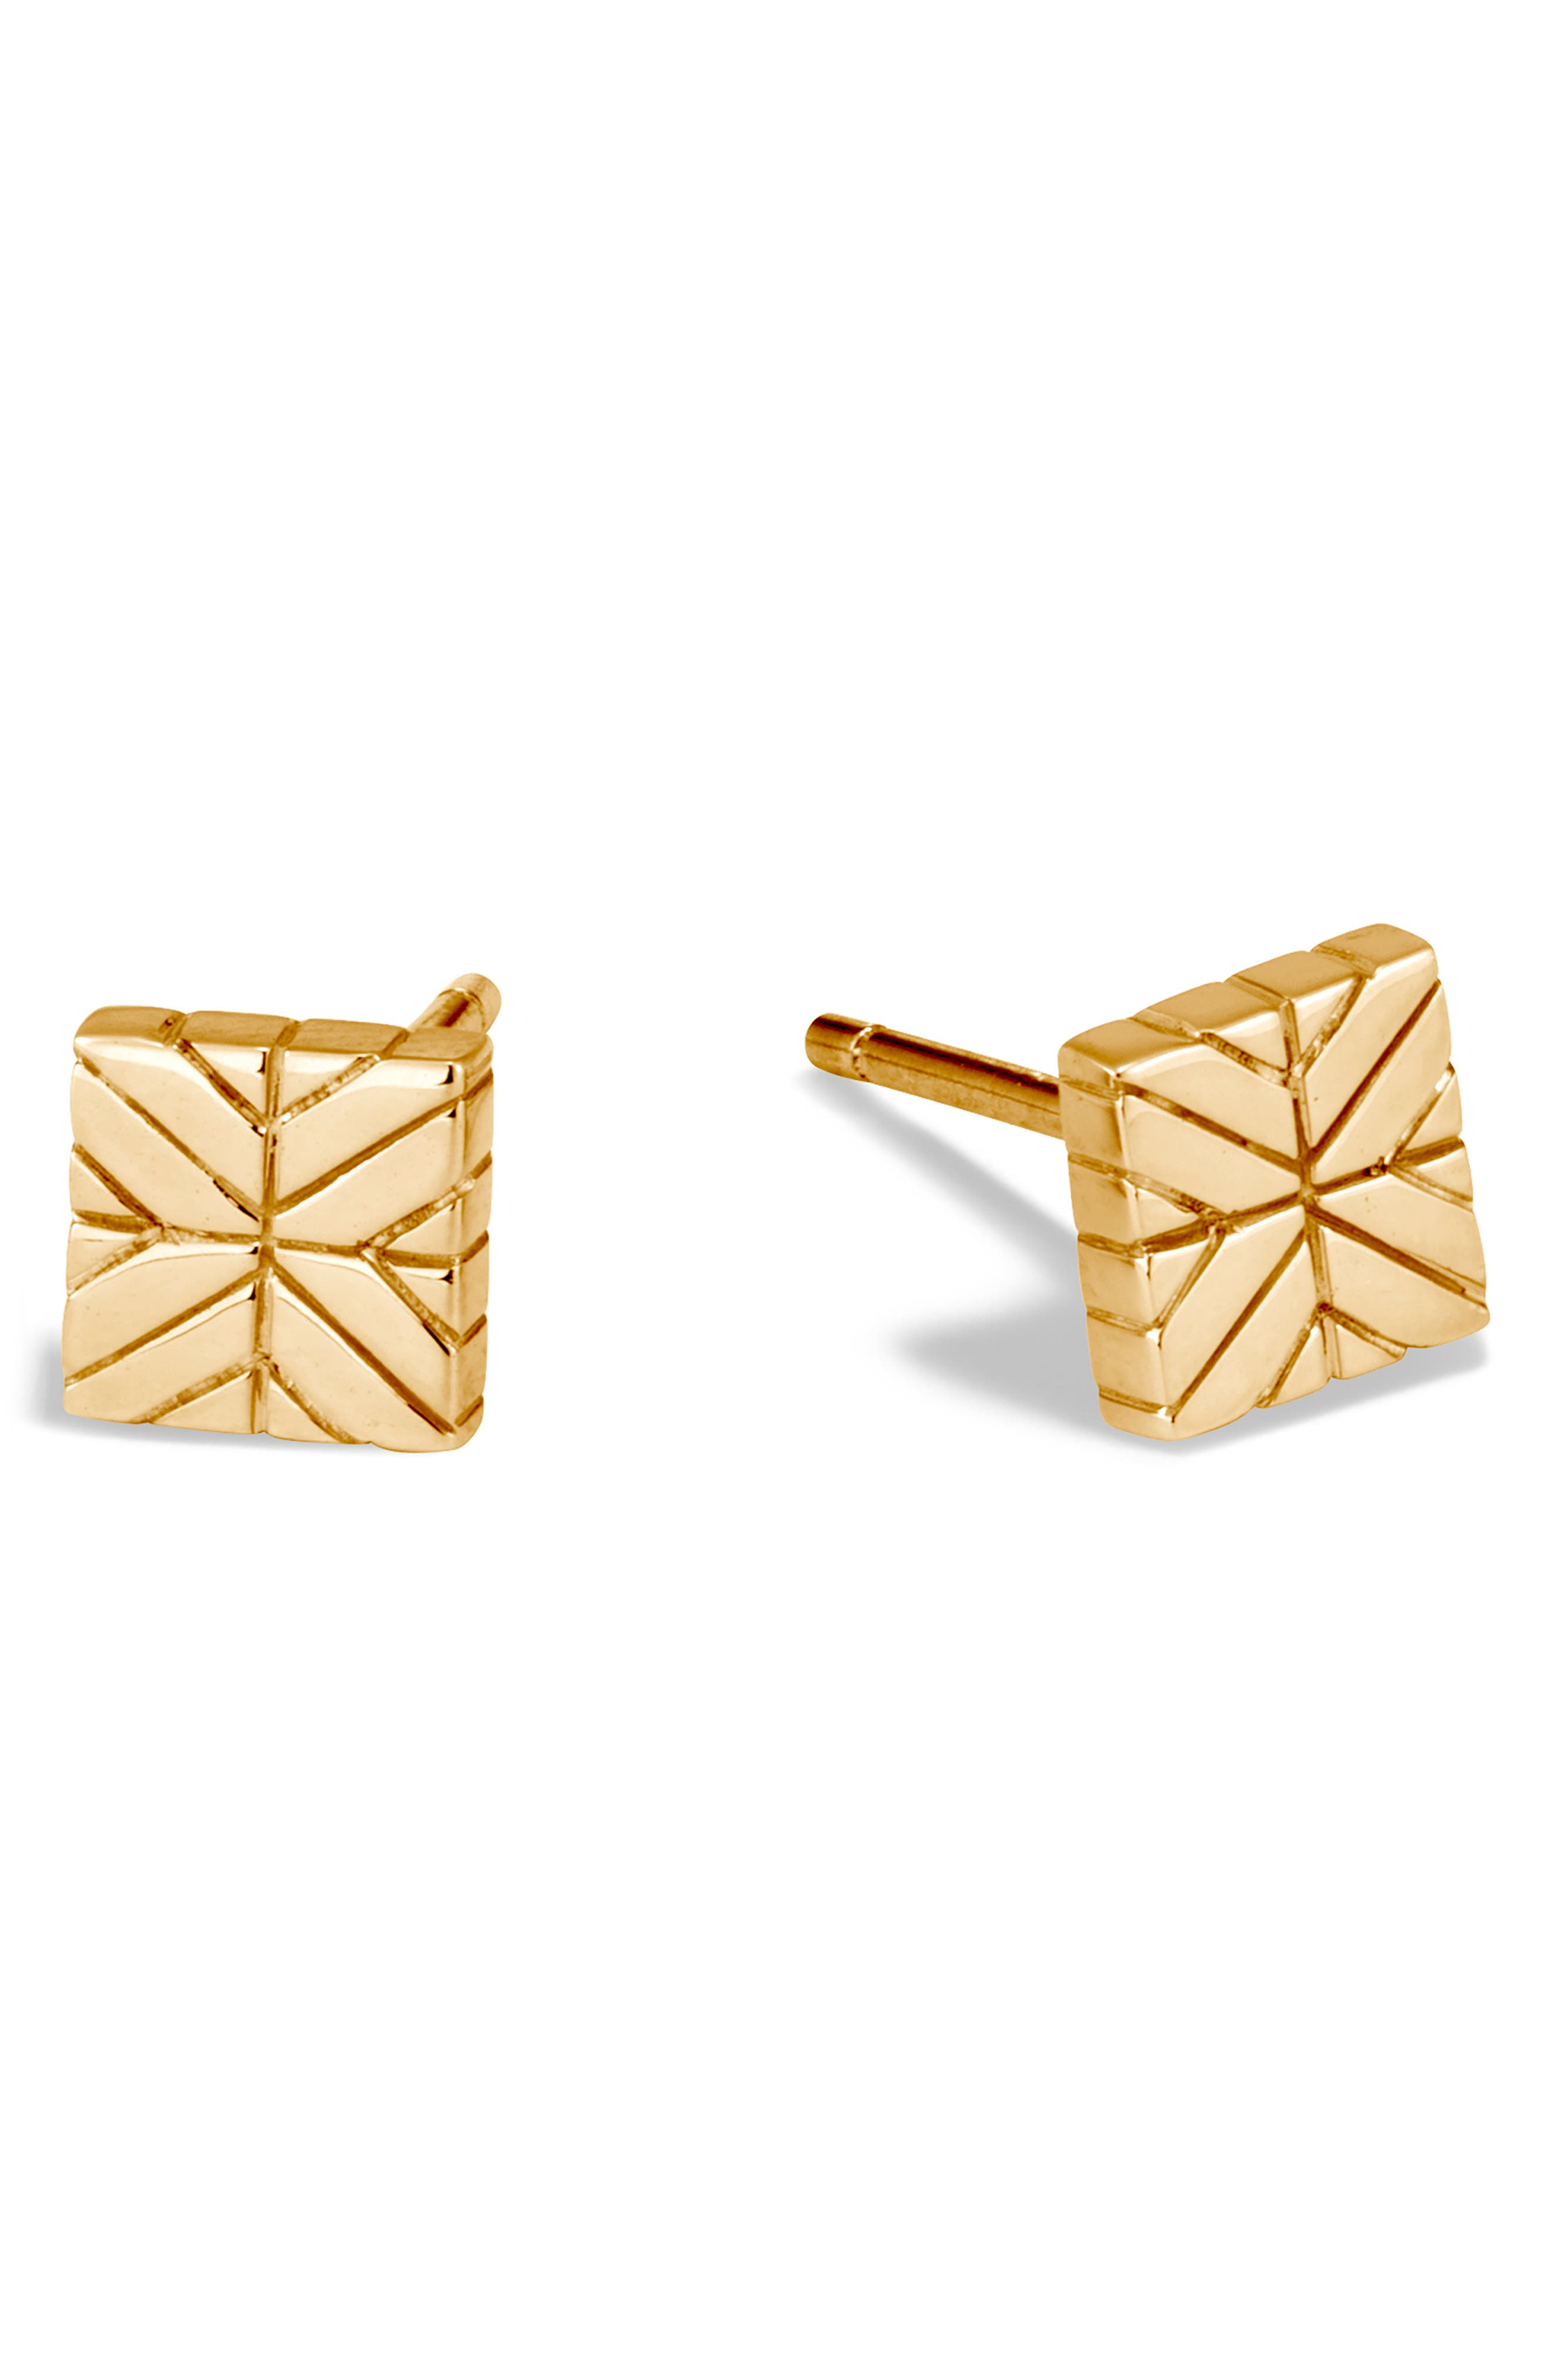 Modern Chain Gold Stud Earrings,                             Main thumbnail 1, color,                             GOLD